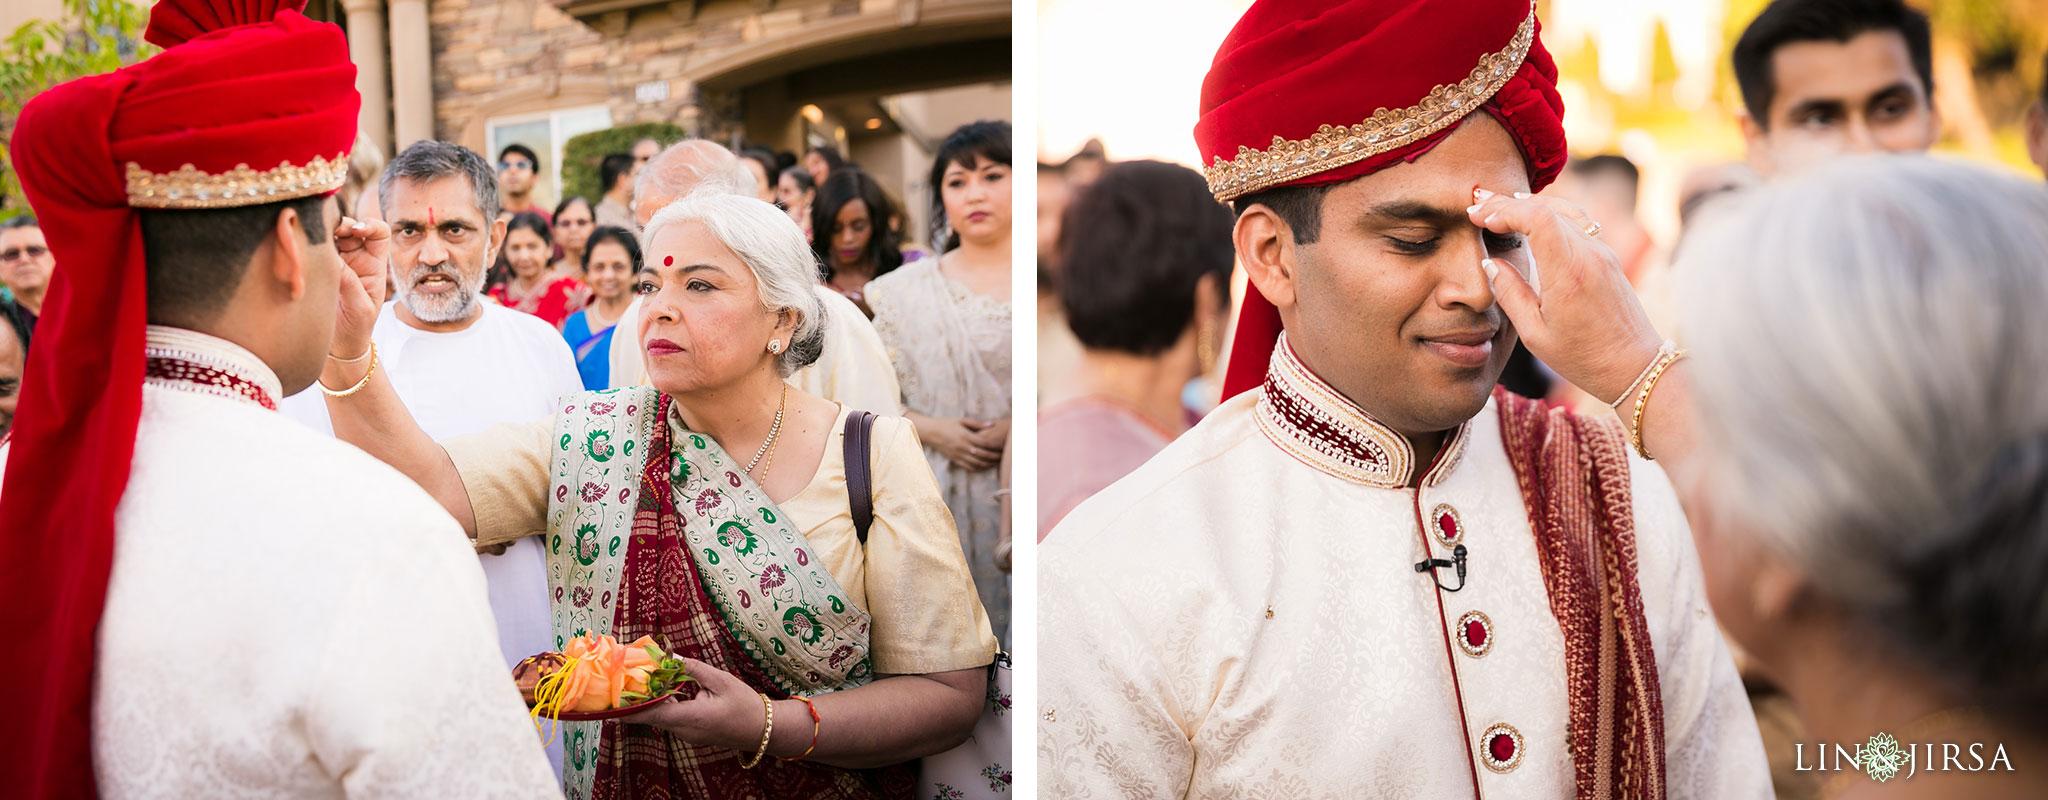 38 Orange County Indian Wedding Photography